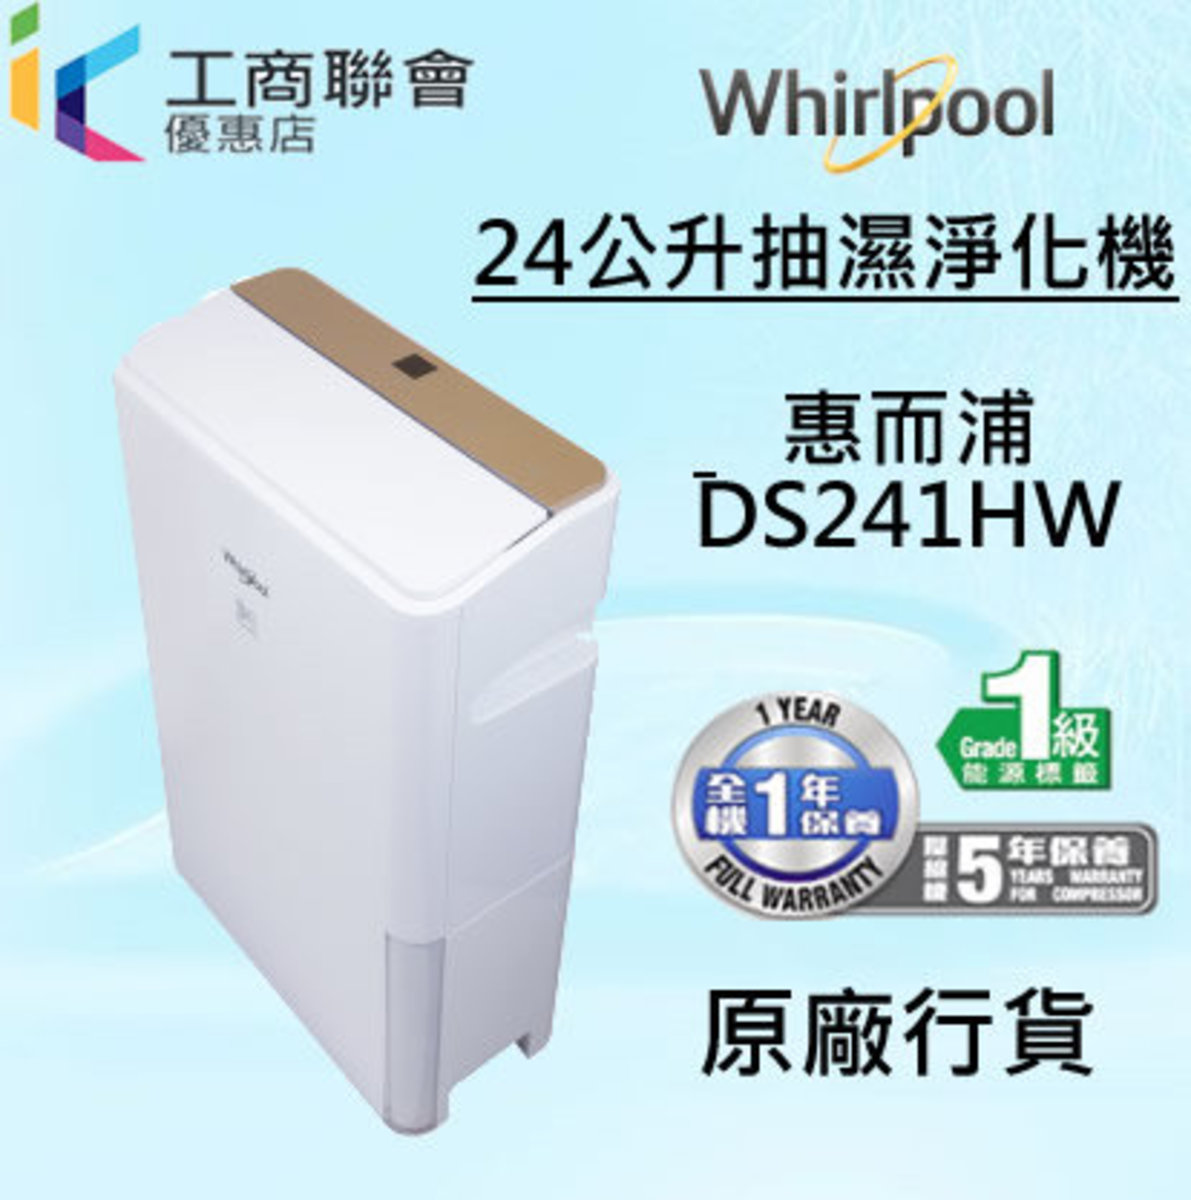 DS241HW  24公升 抽濕淨化機